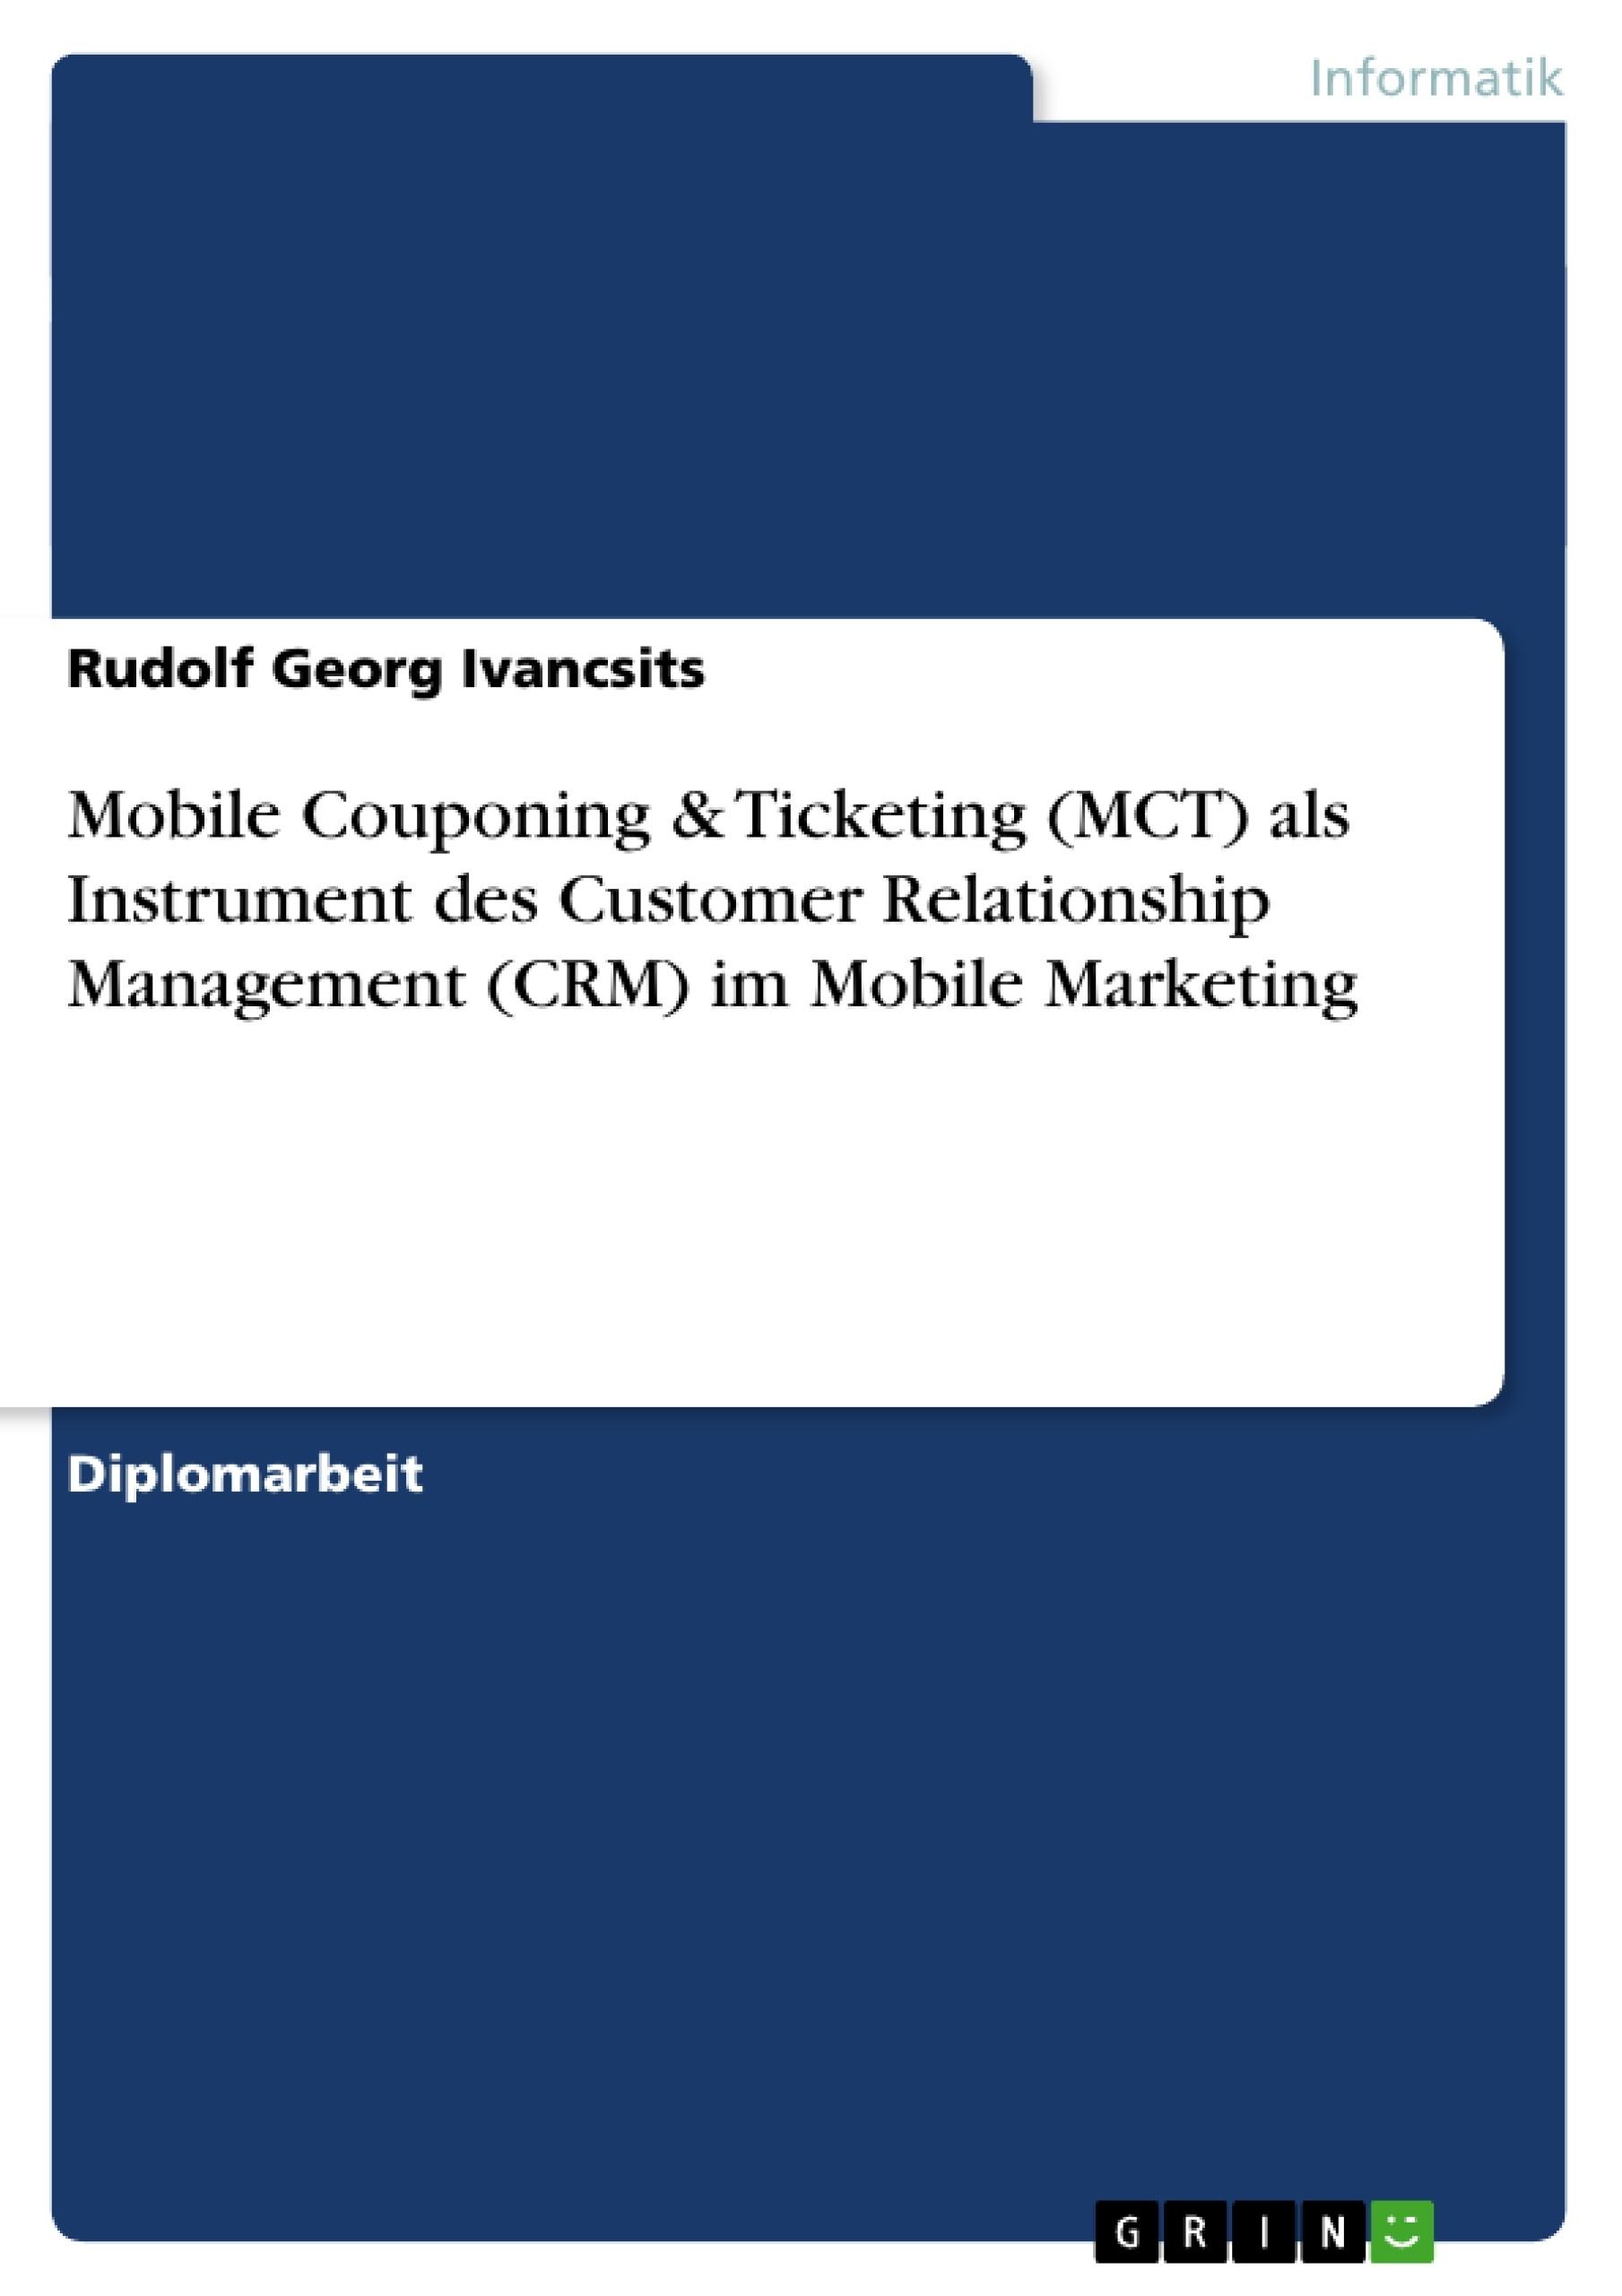 Titel: Mobile Couponing & Ticketing (MCT) als Instrument des Customer Relationship Management (CRM) im Mobile Marketing